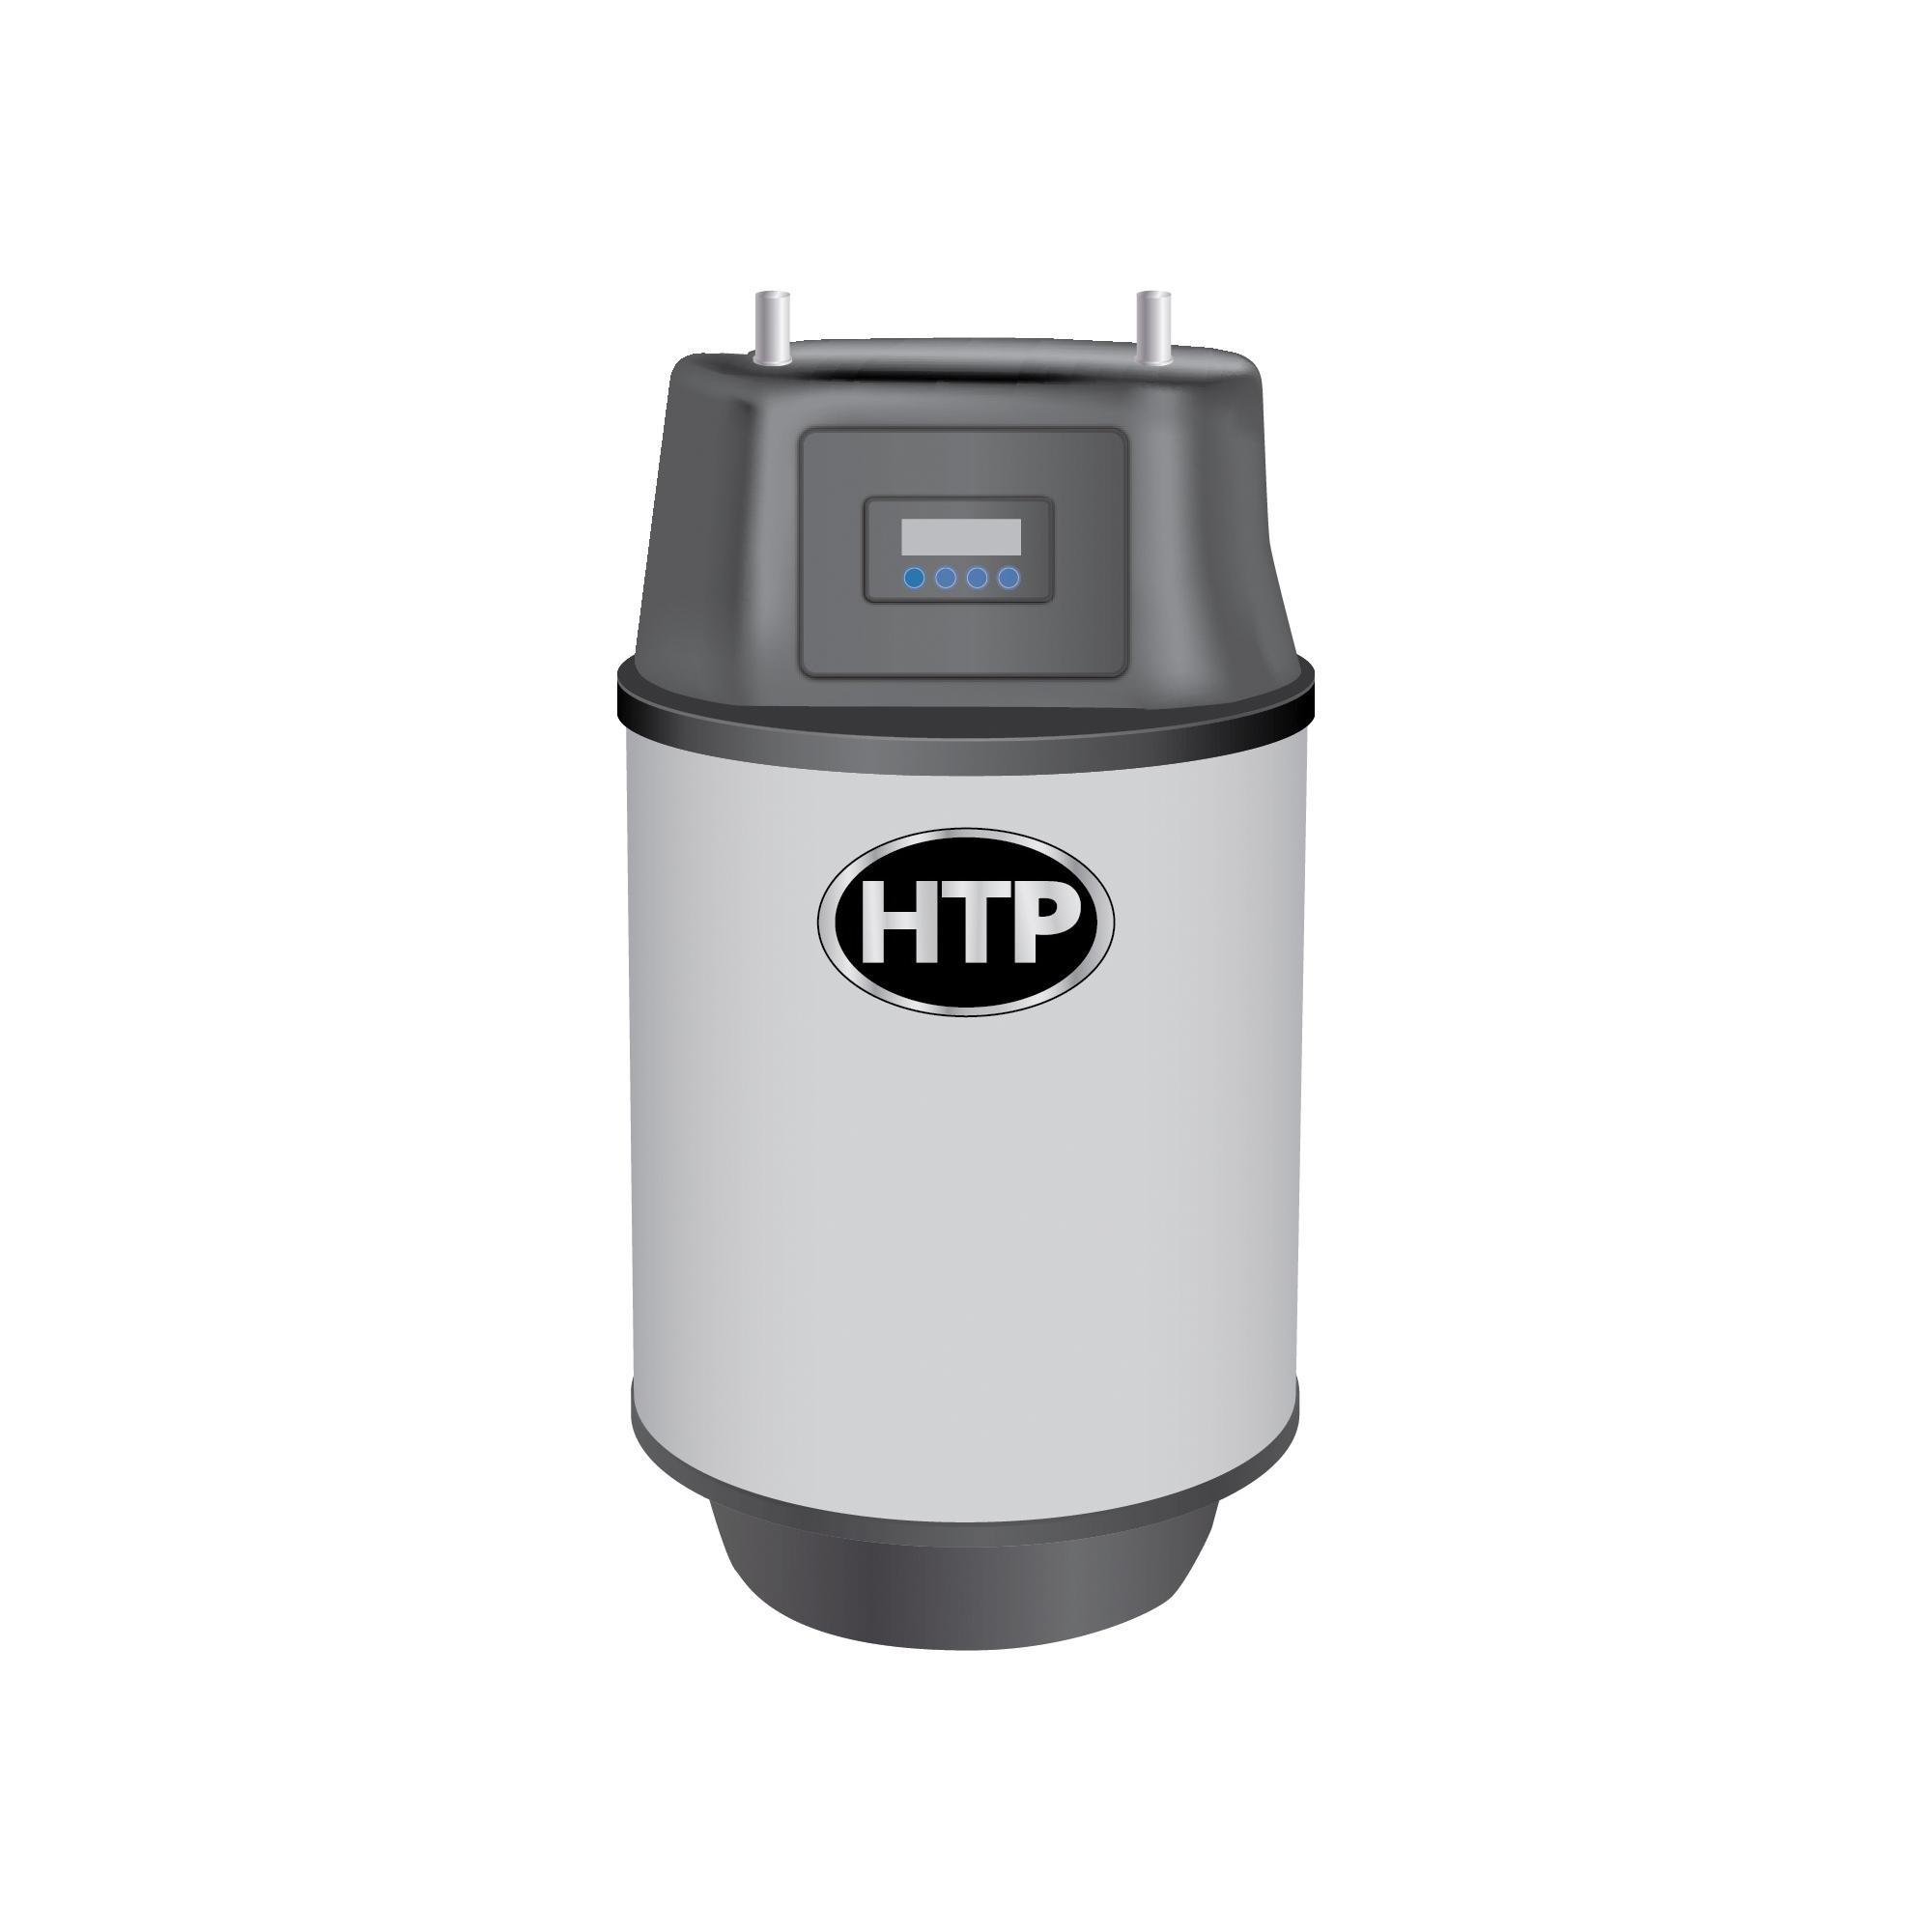 HTP Crossover™ RGH20 High-Efficiency Water Heater, 50000 to 100000 Btu/hr Heating, 20 gal Tank, Natural Fuel